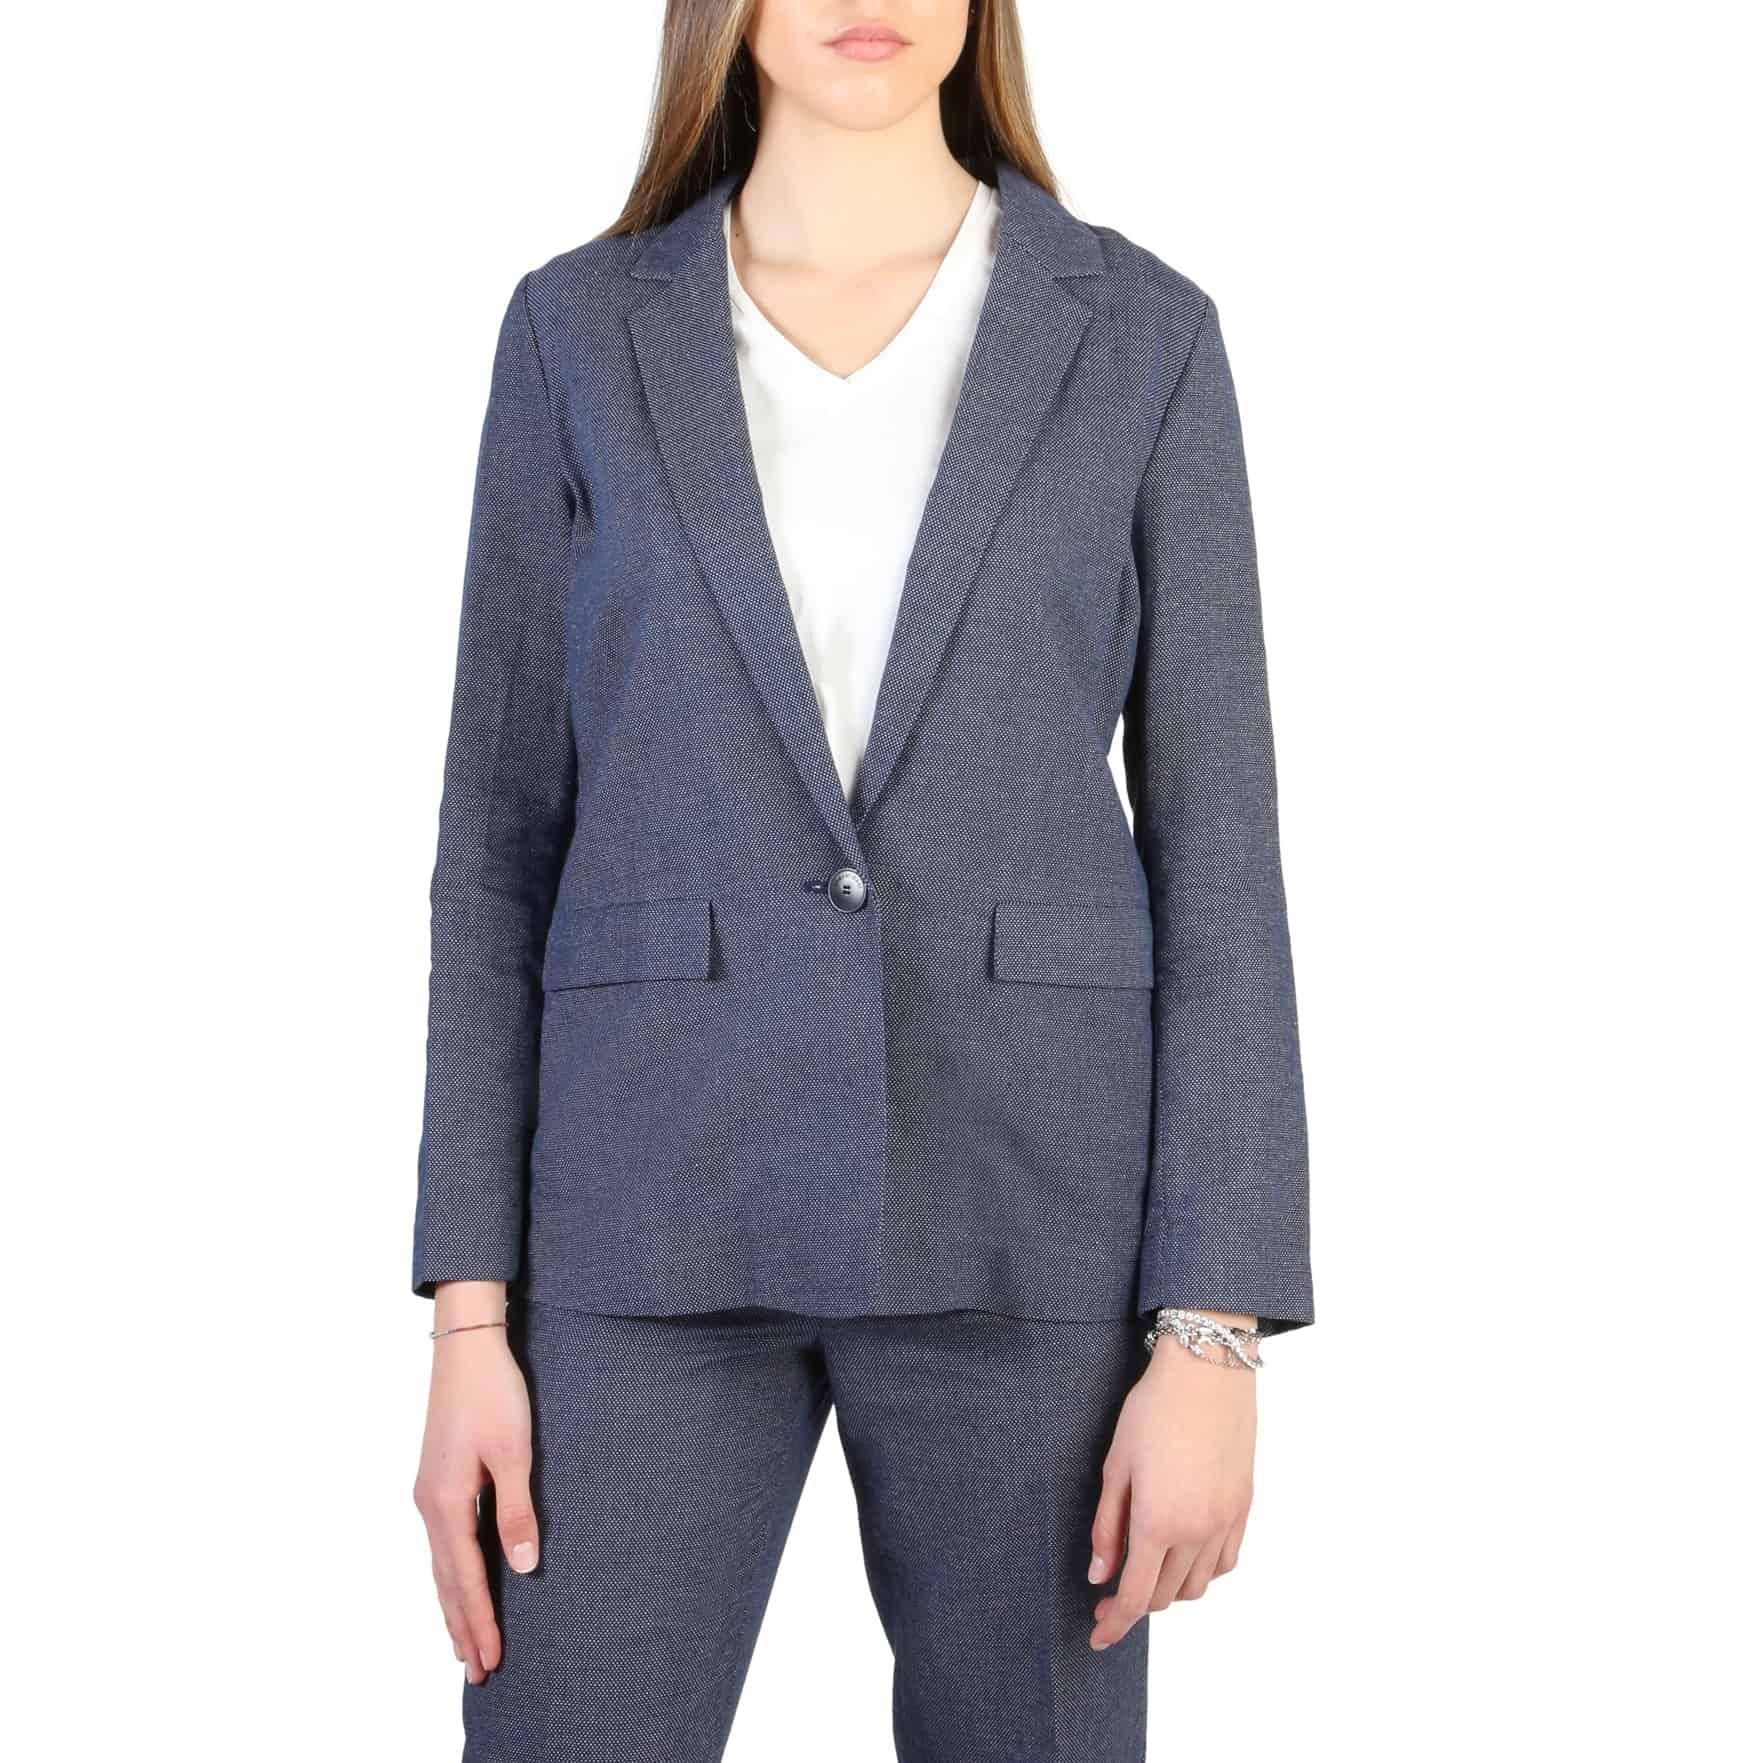 Armani Jeans – 3Y5G42_5NYLZ – Blauw Designeritems.nl